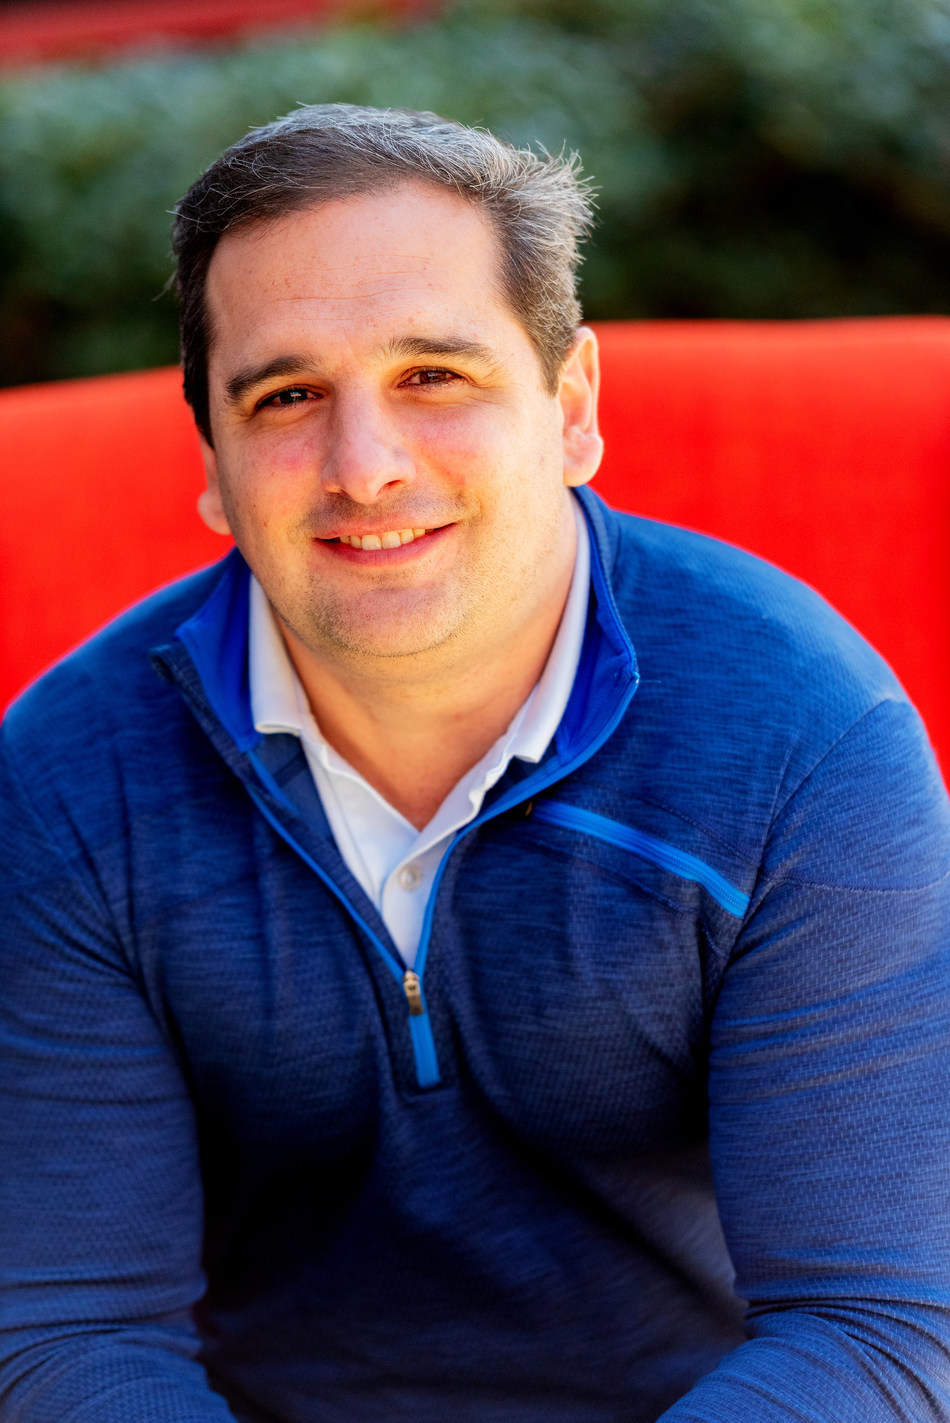 Mathieu Stevenson - Snag CEO